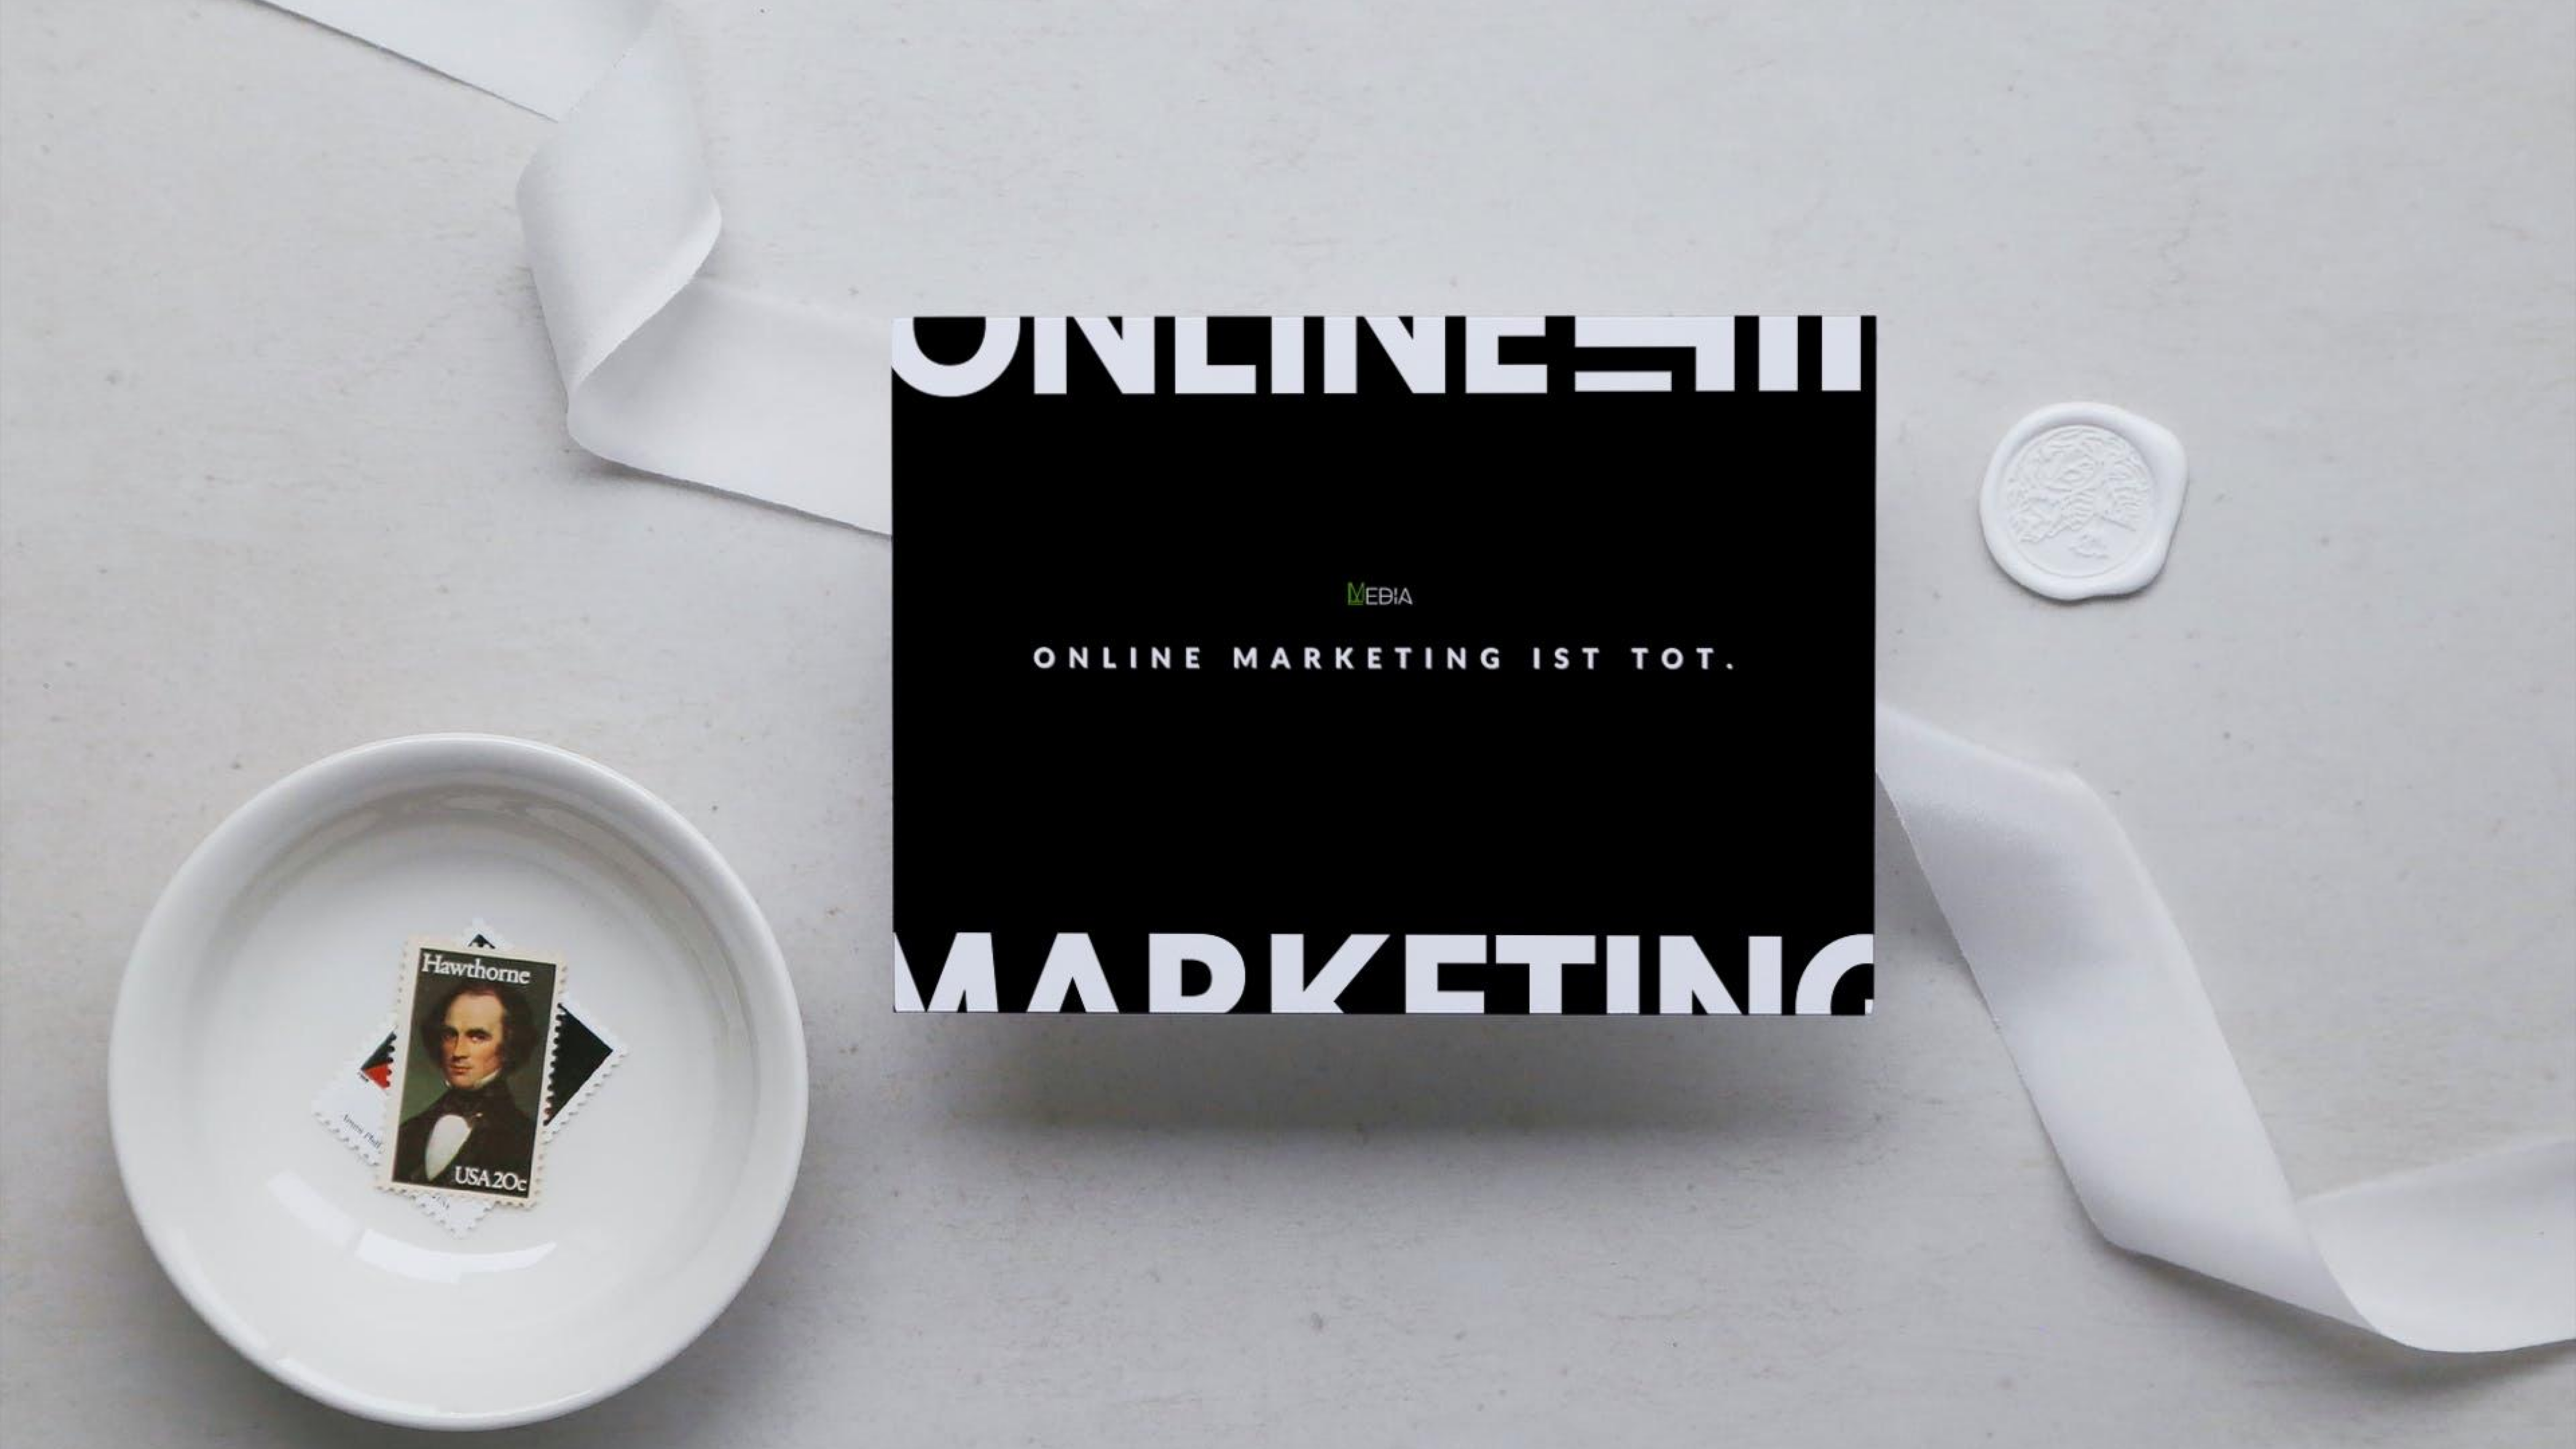 Online Marketing ist Tot